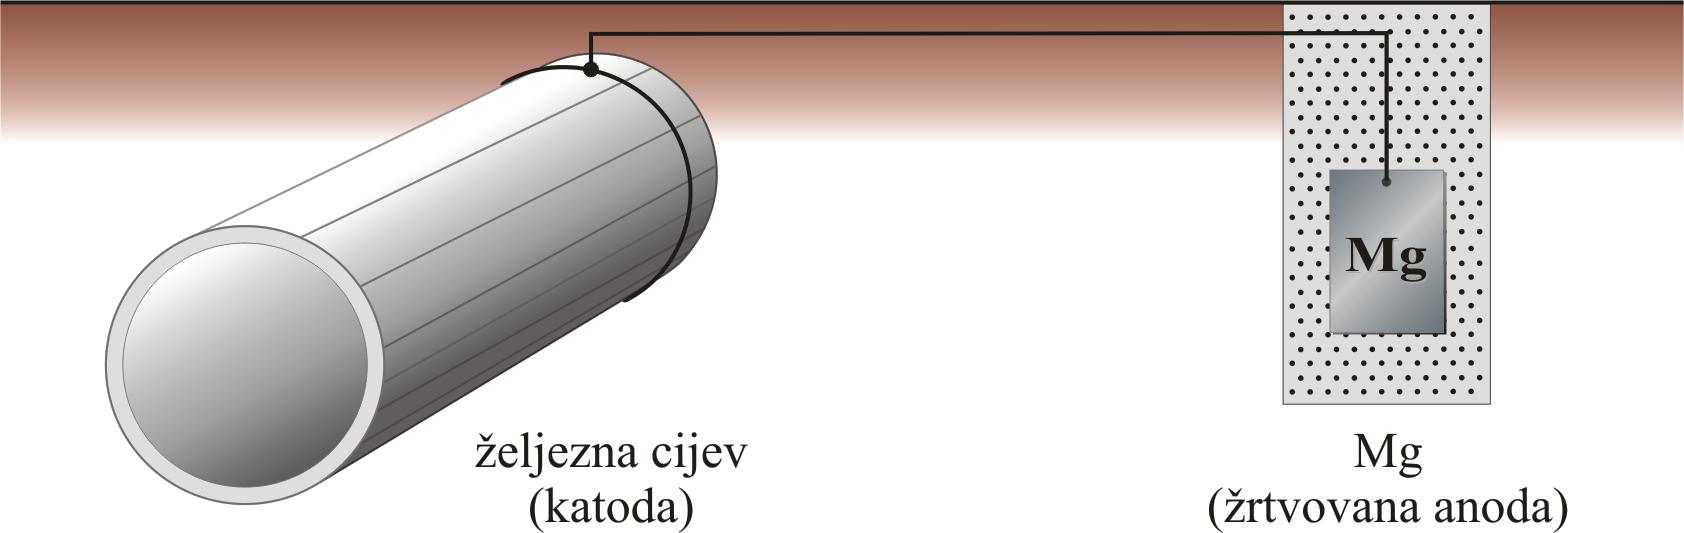 Direktni link: https://www.periodni.com/gallery/katodna_zastita.png